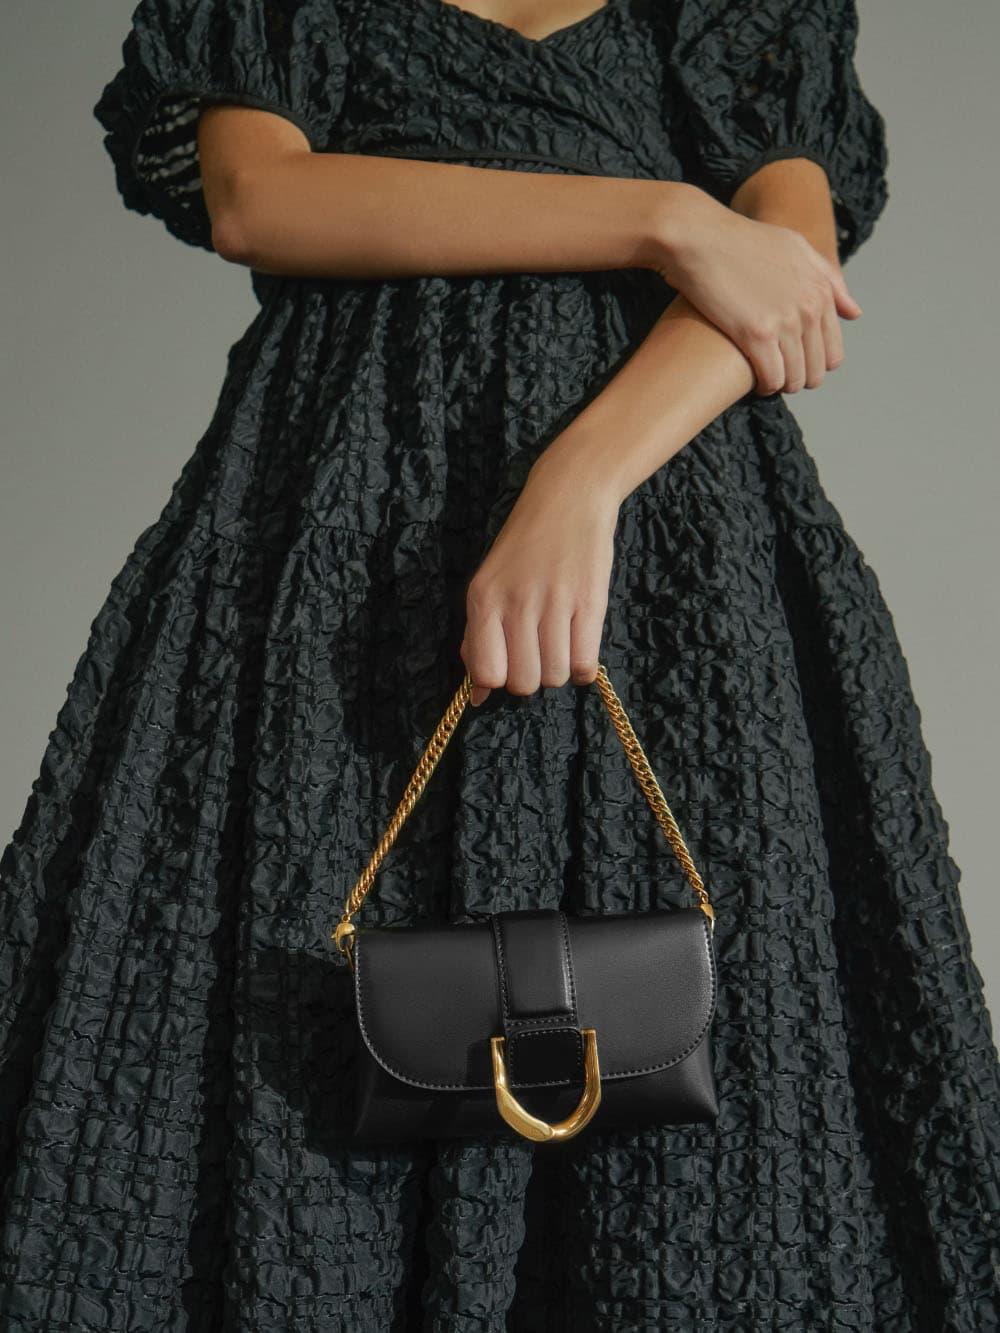 Women's metallic buckle crossbody bag in black - CHARLES & KEITH